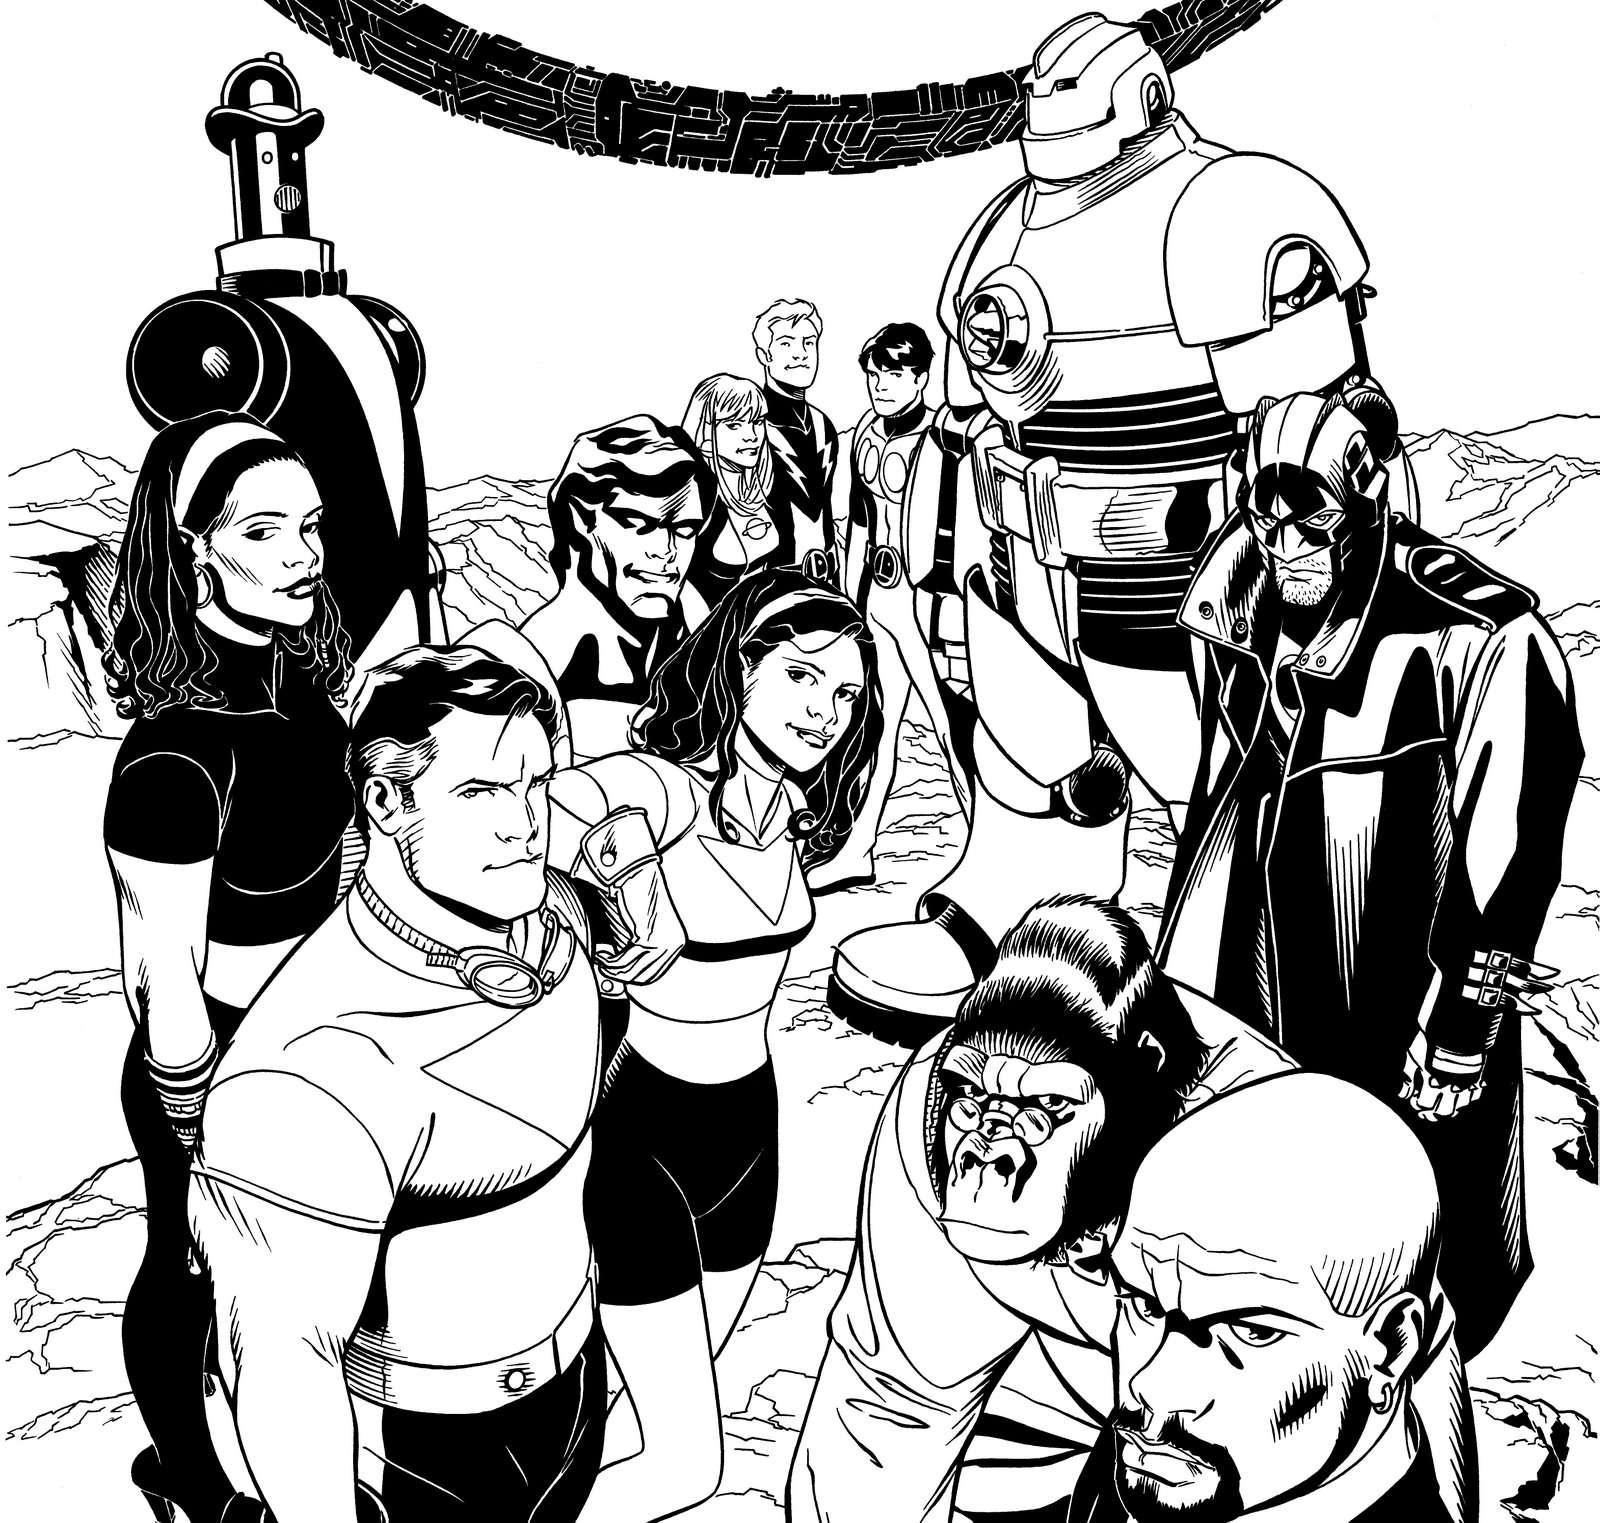 Comic Book Artist: Chris Sprouse